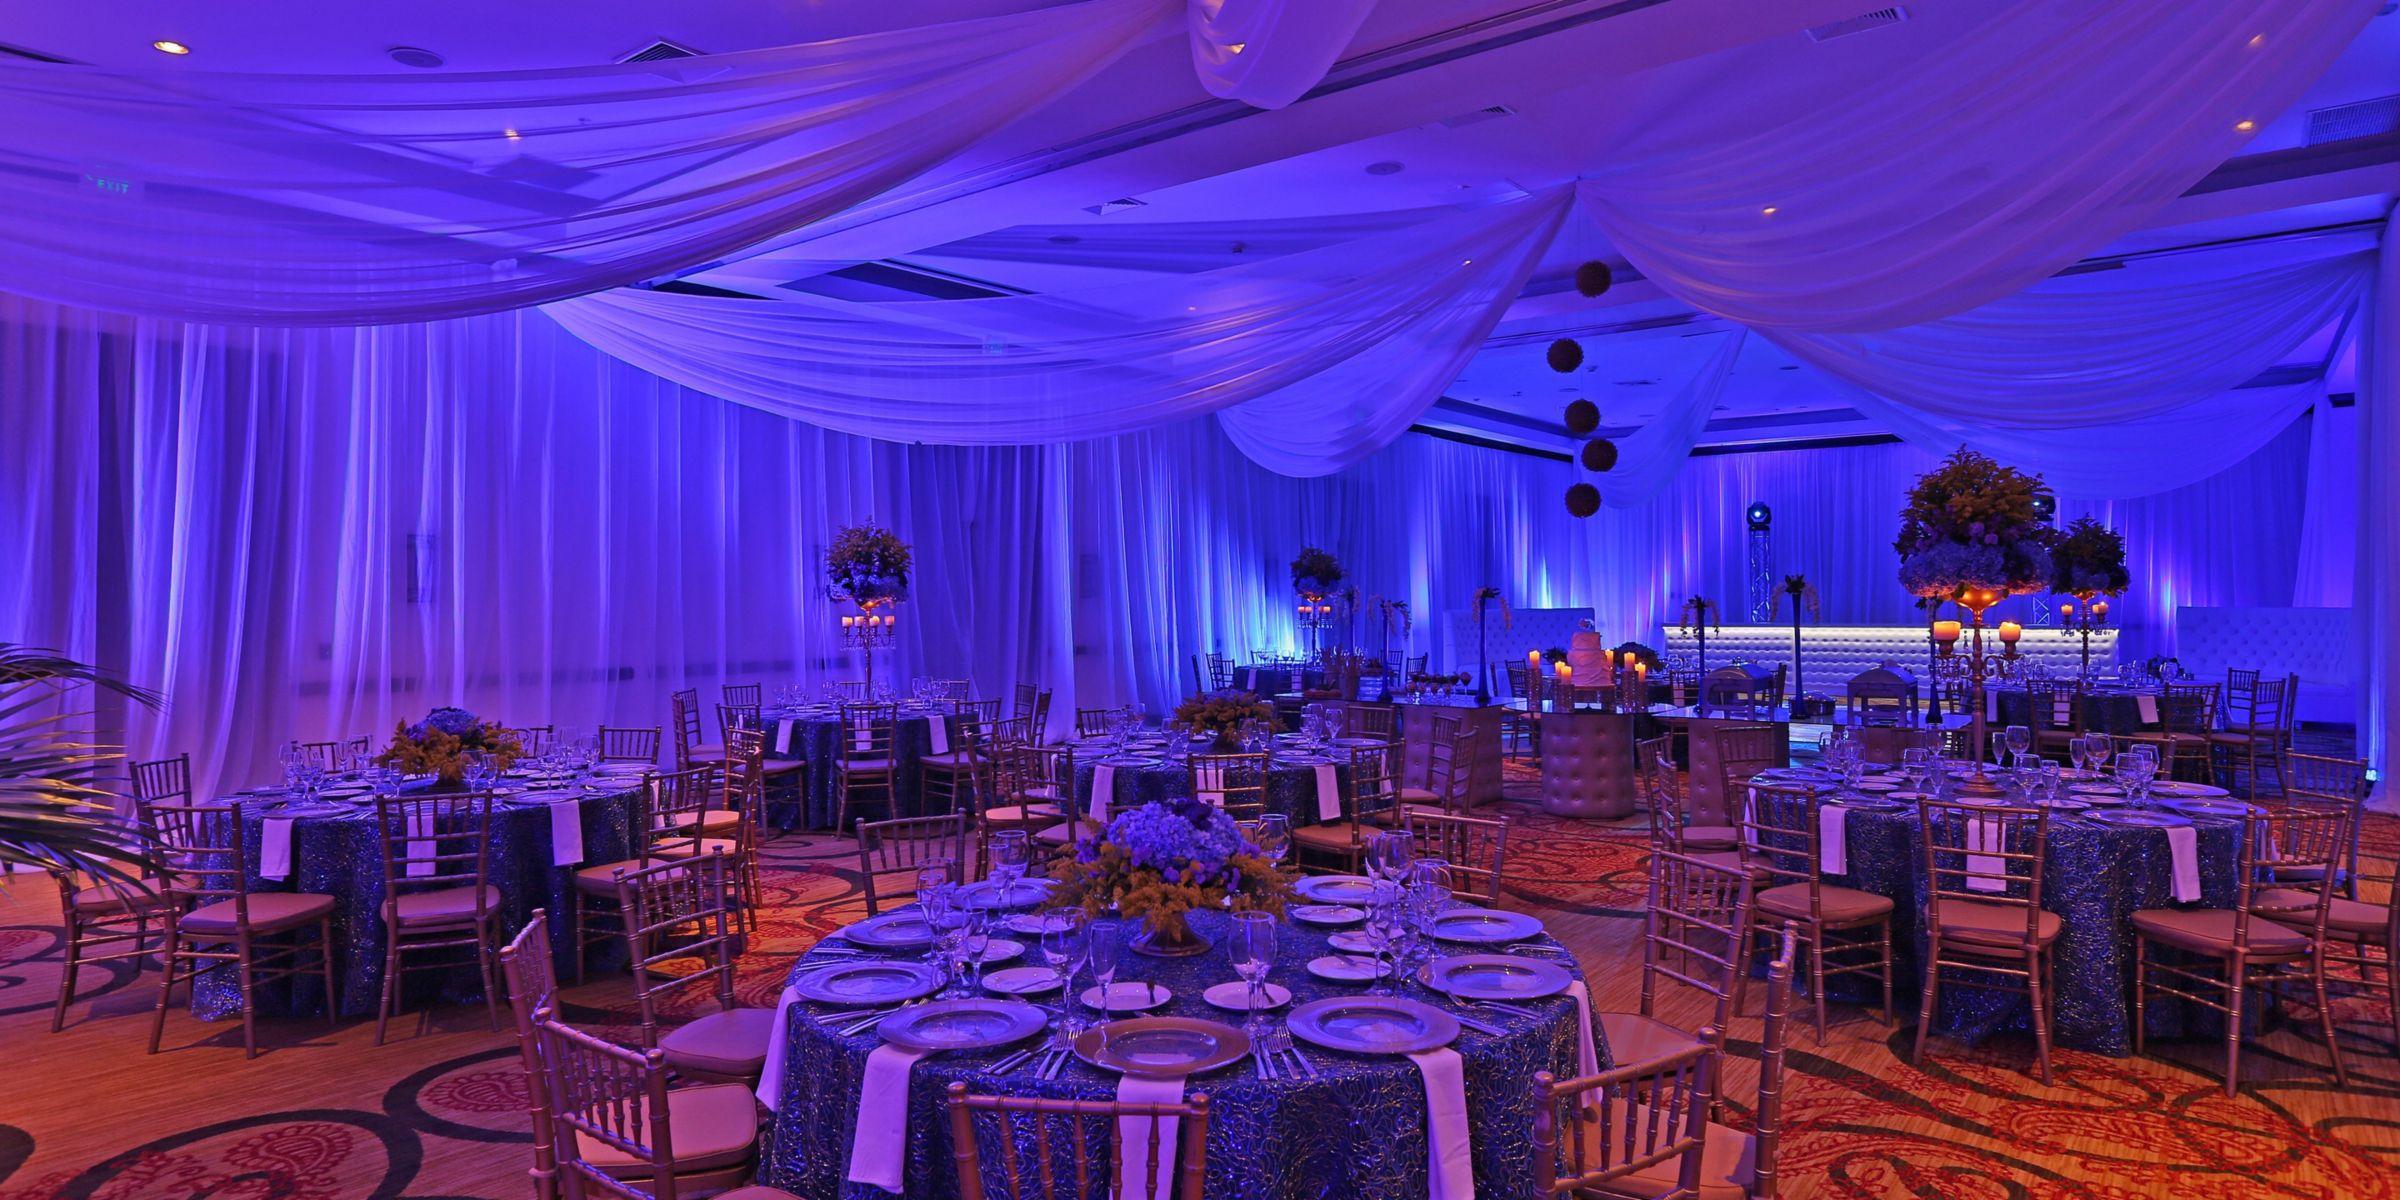 Intercontinental Real San Pedro Sula Hotel Meeting Rooms Wedding Cetak Foto Ukuran 24r Salon Rentals